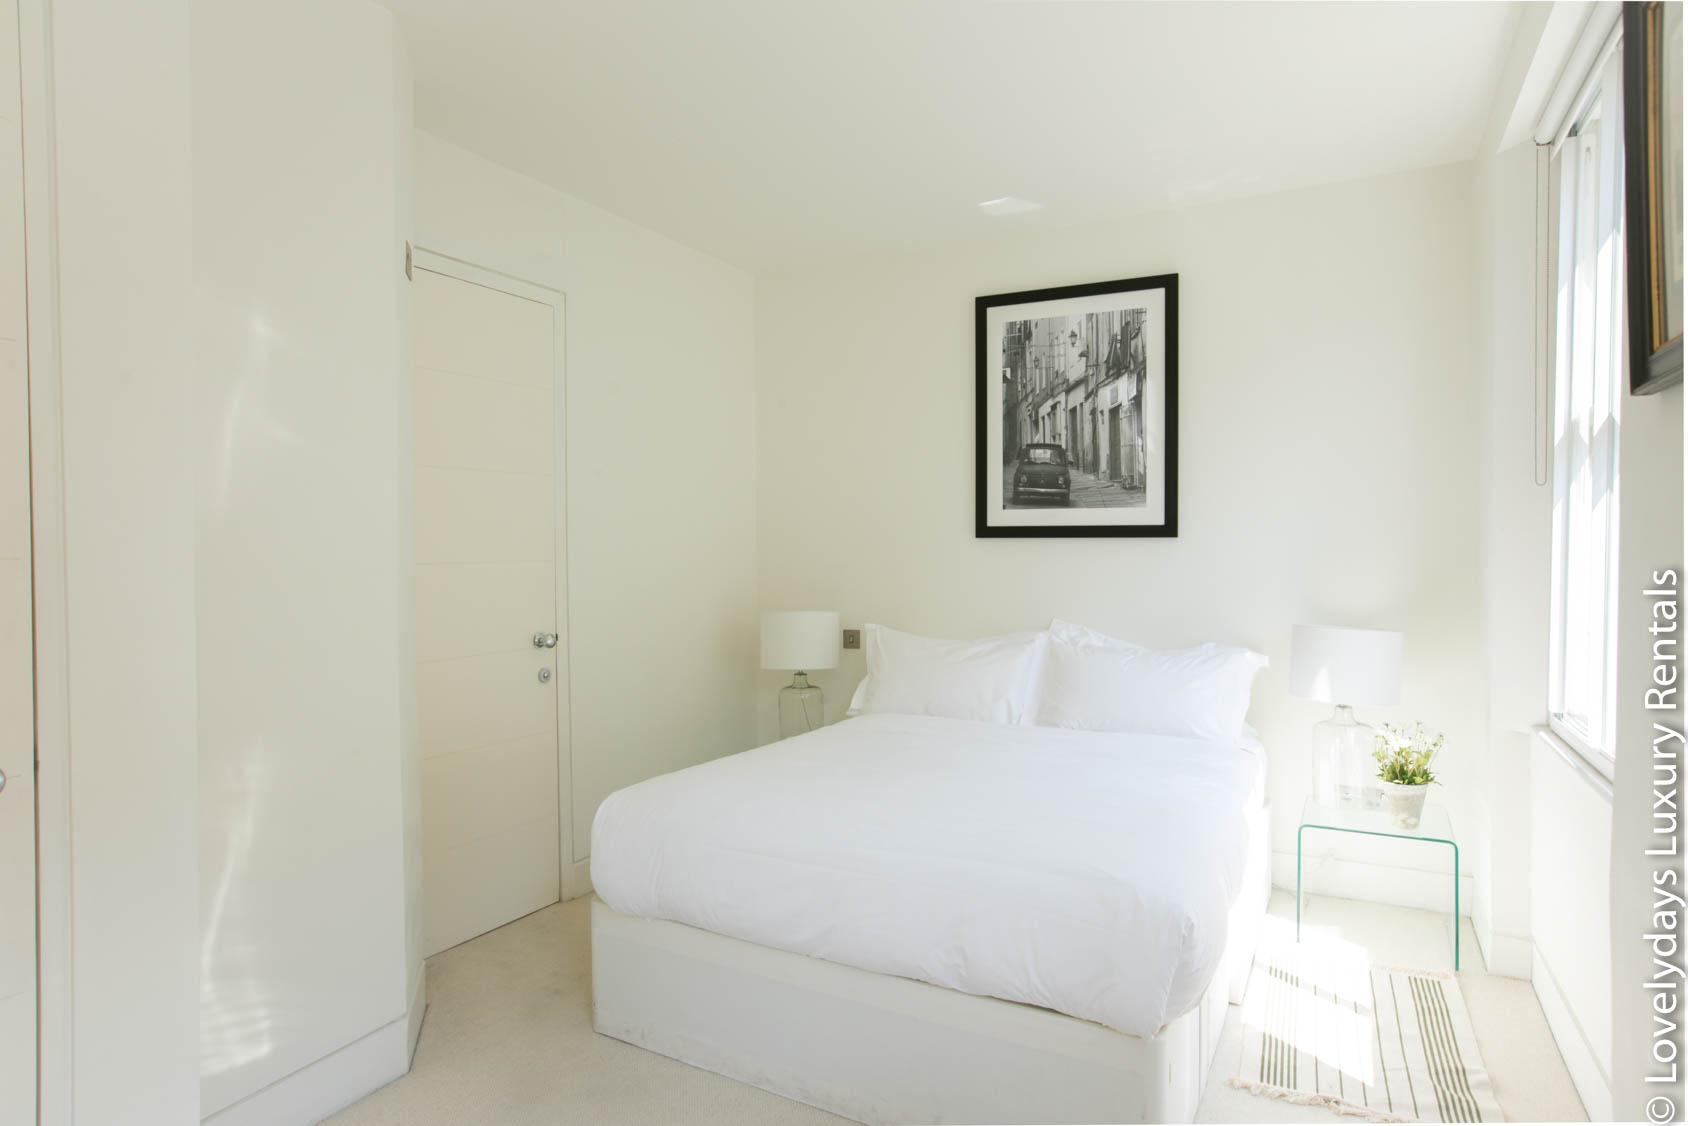 Lovelydays luxury service apartment rental - London - Fitzrovia - Foley Street - Lovelysuite - 2 bedrooms - 2 bathrooms - Double bed - e54565ba2777 - Lovelydays